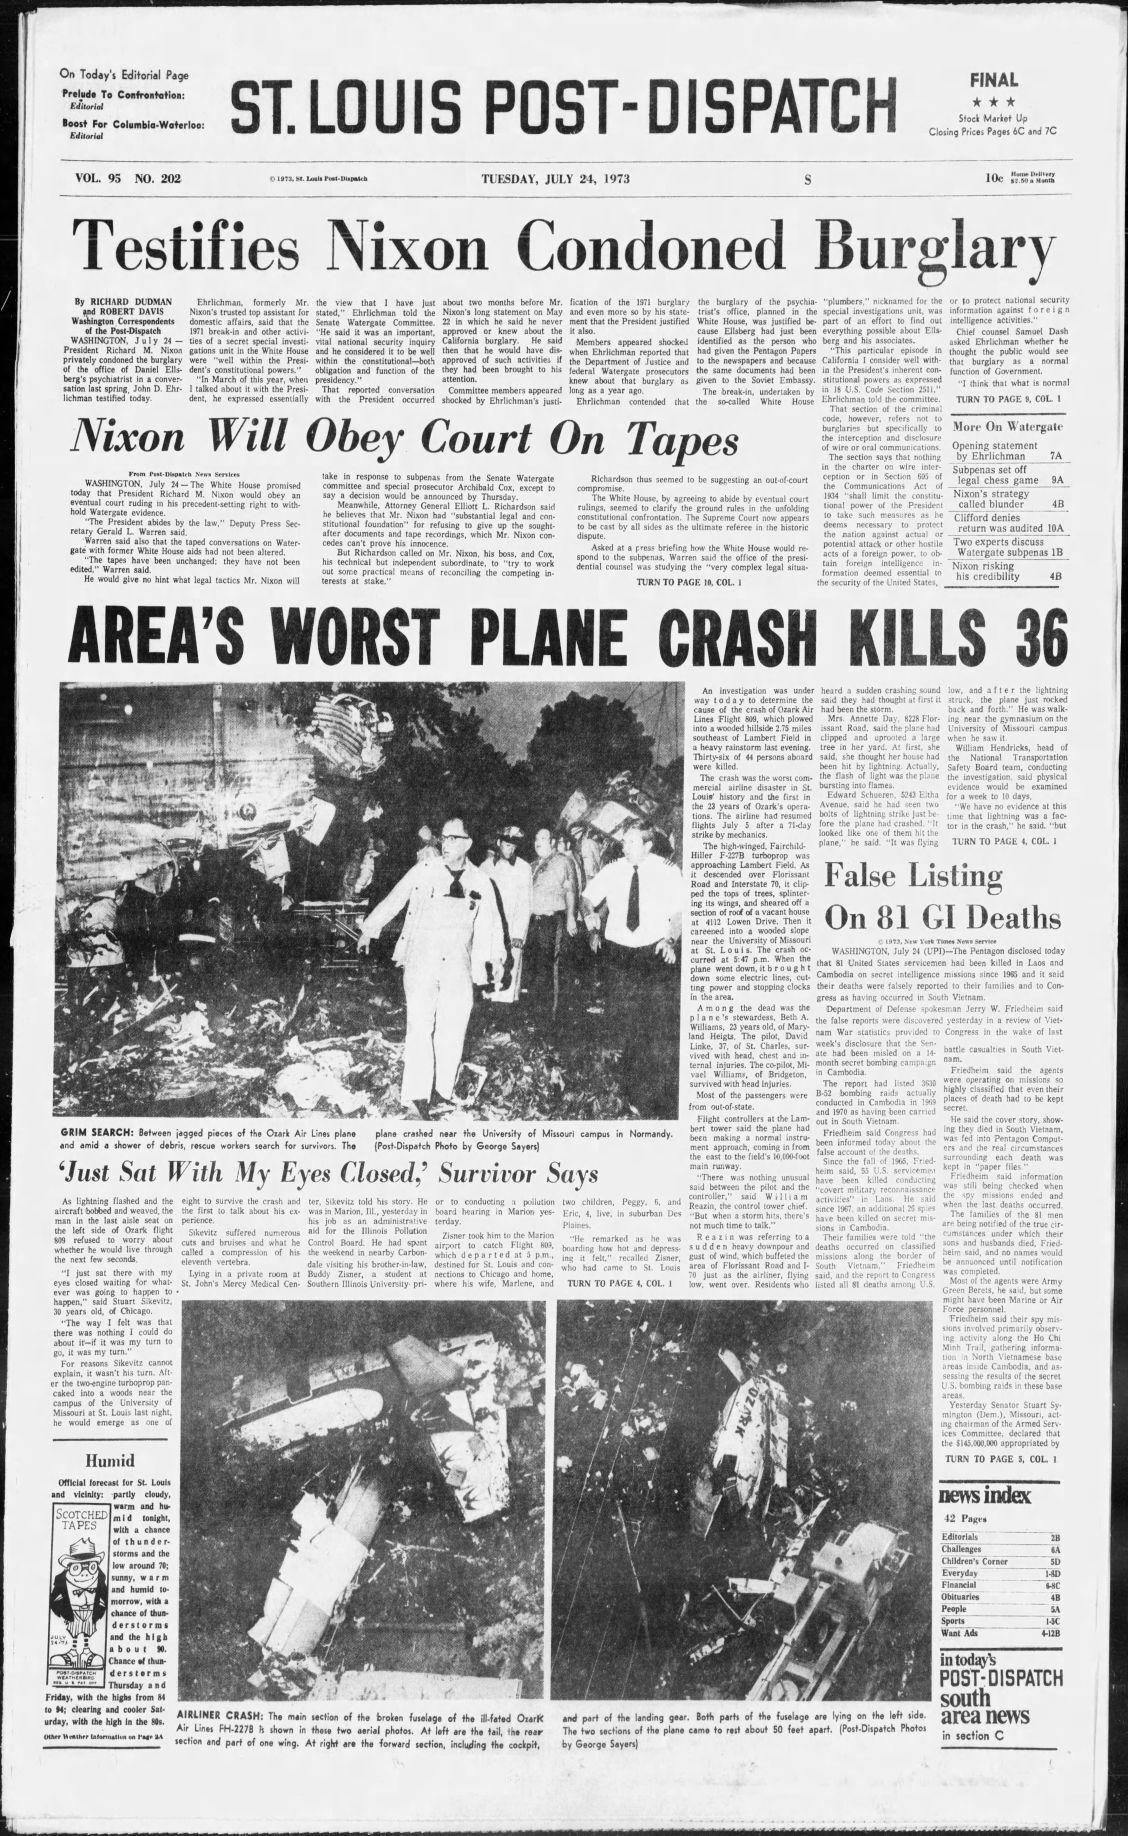 July 24, 1973 - Area's worst plane crash kills 36